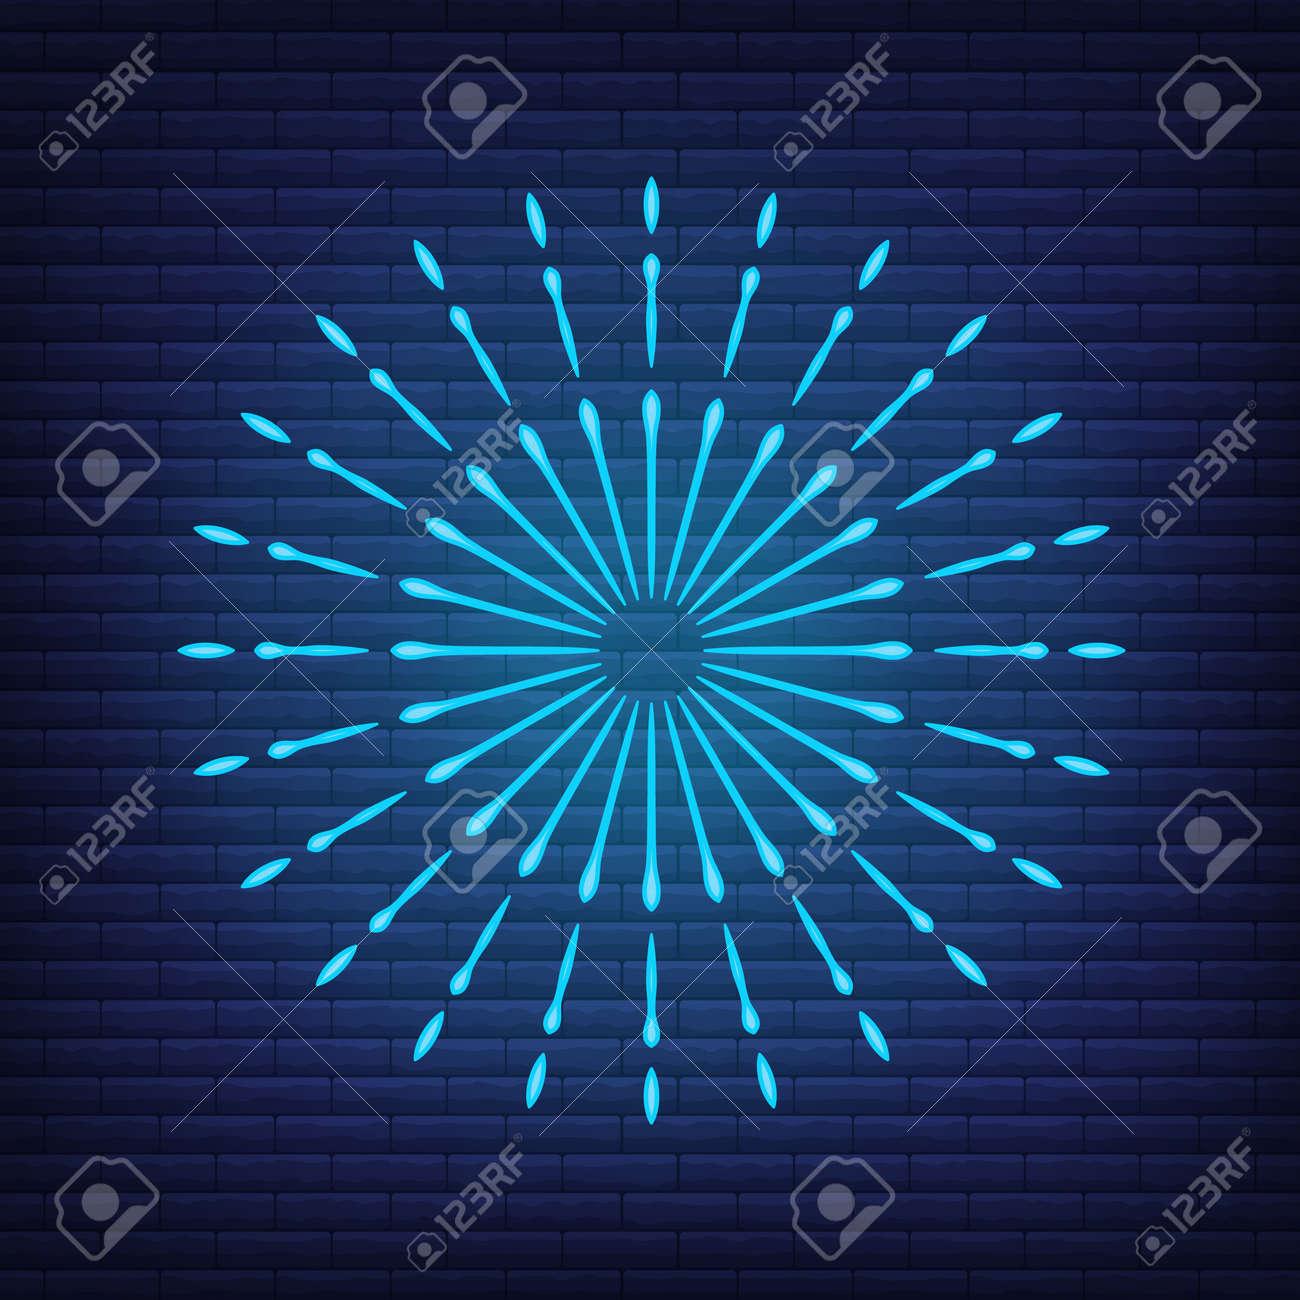 Retro design light sunburst neon style glow geometric shape, vintage rays sunlight explosion icon concept vector illustration, isolated on black wall. Minimal blue firework burst label, sunbeam badge. - 168394773